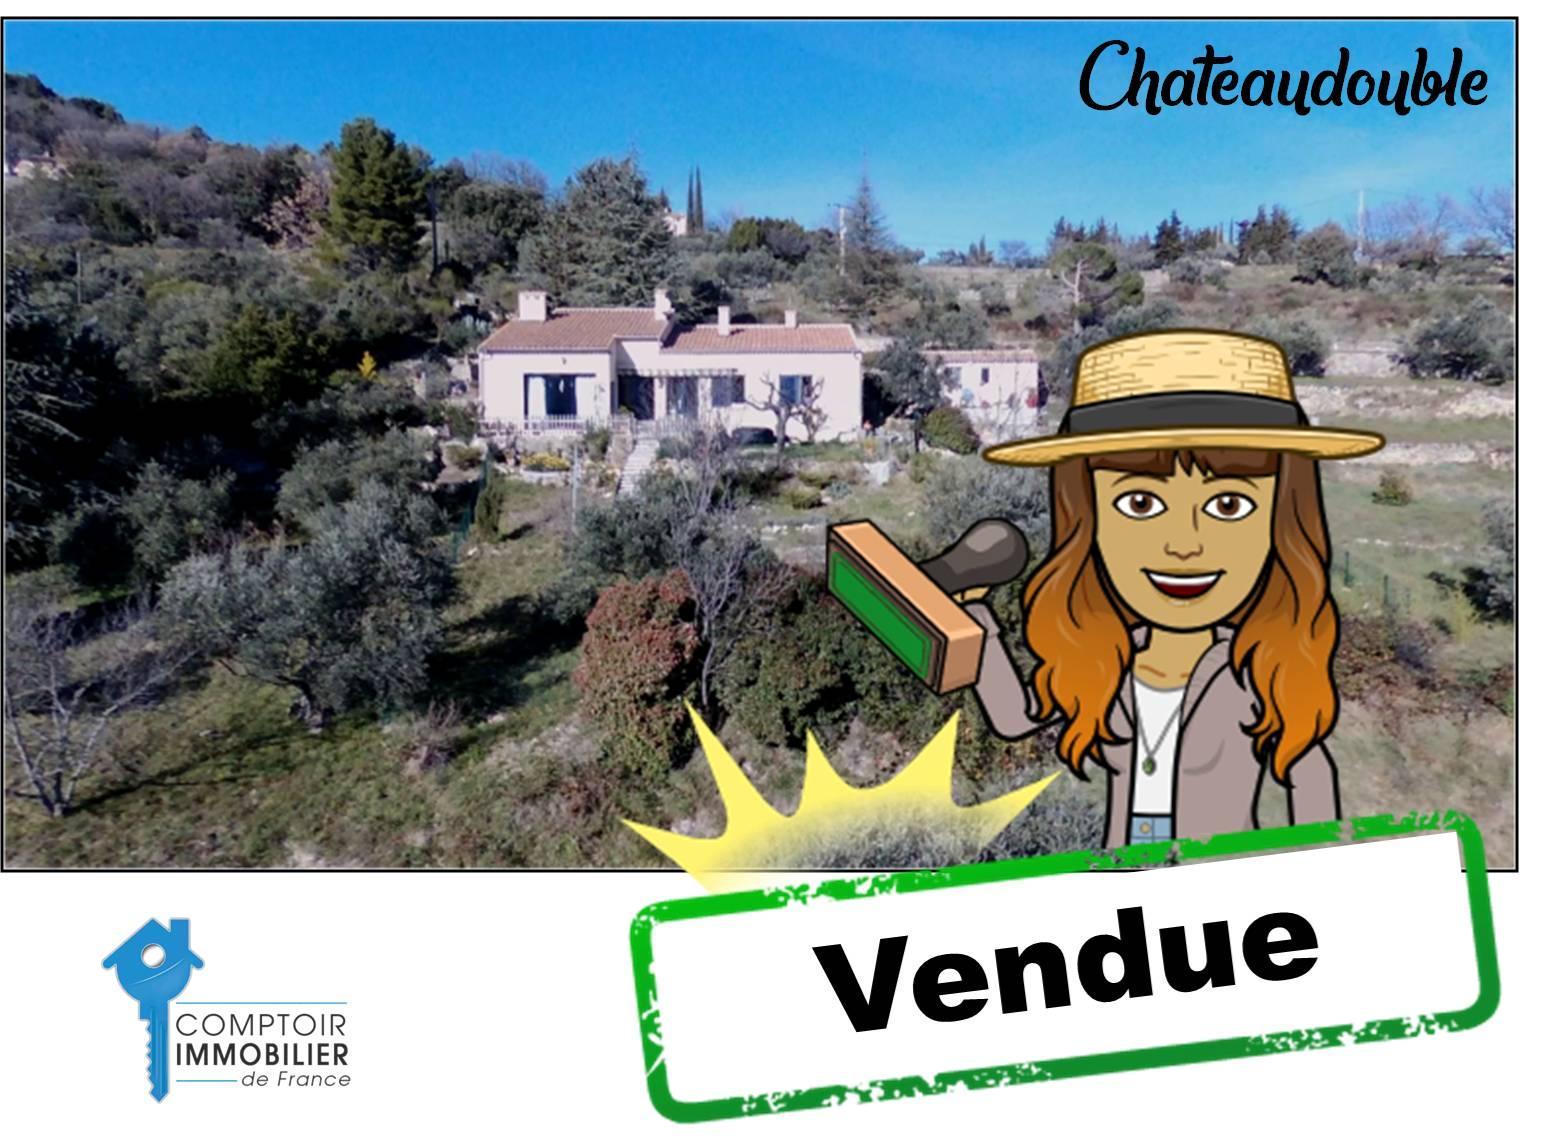 Chateaudouble - 318 000 € - 2 chambres - Terrain 3100 m²